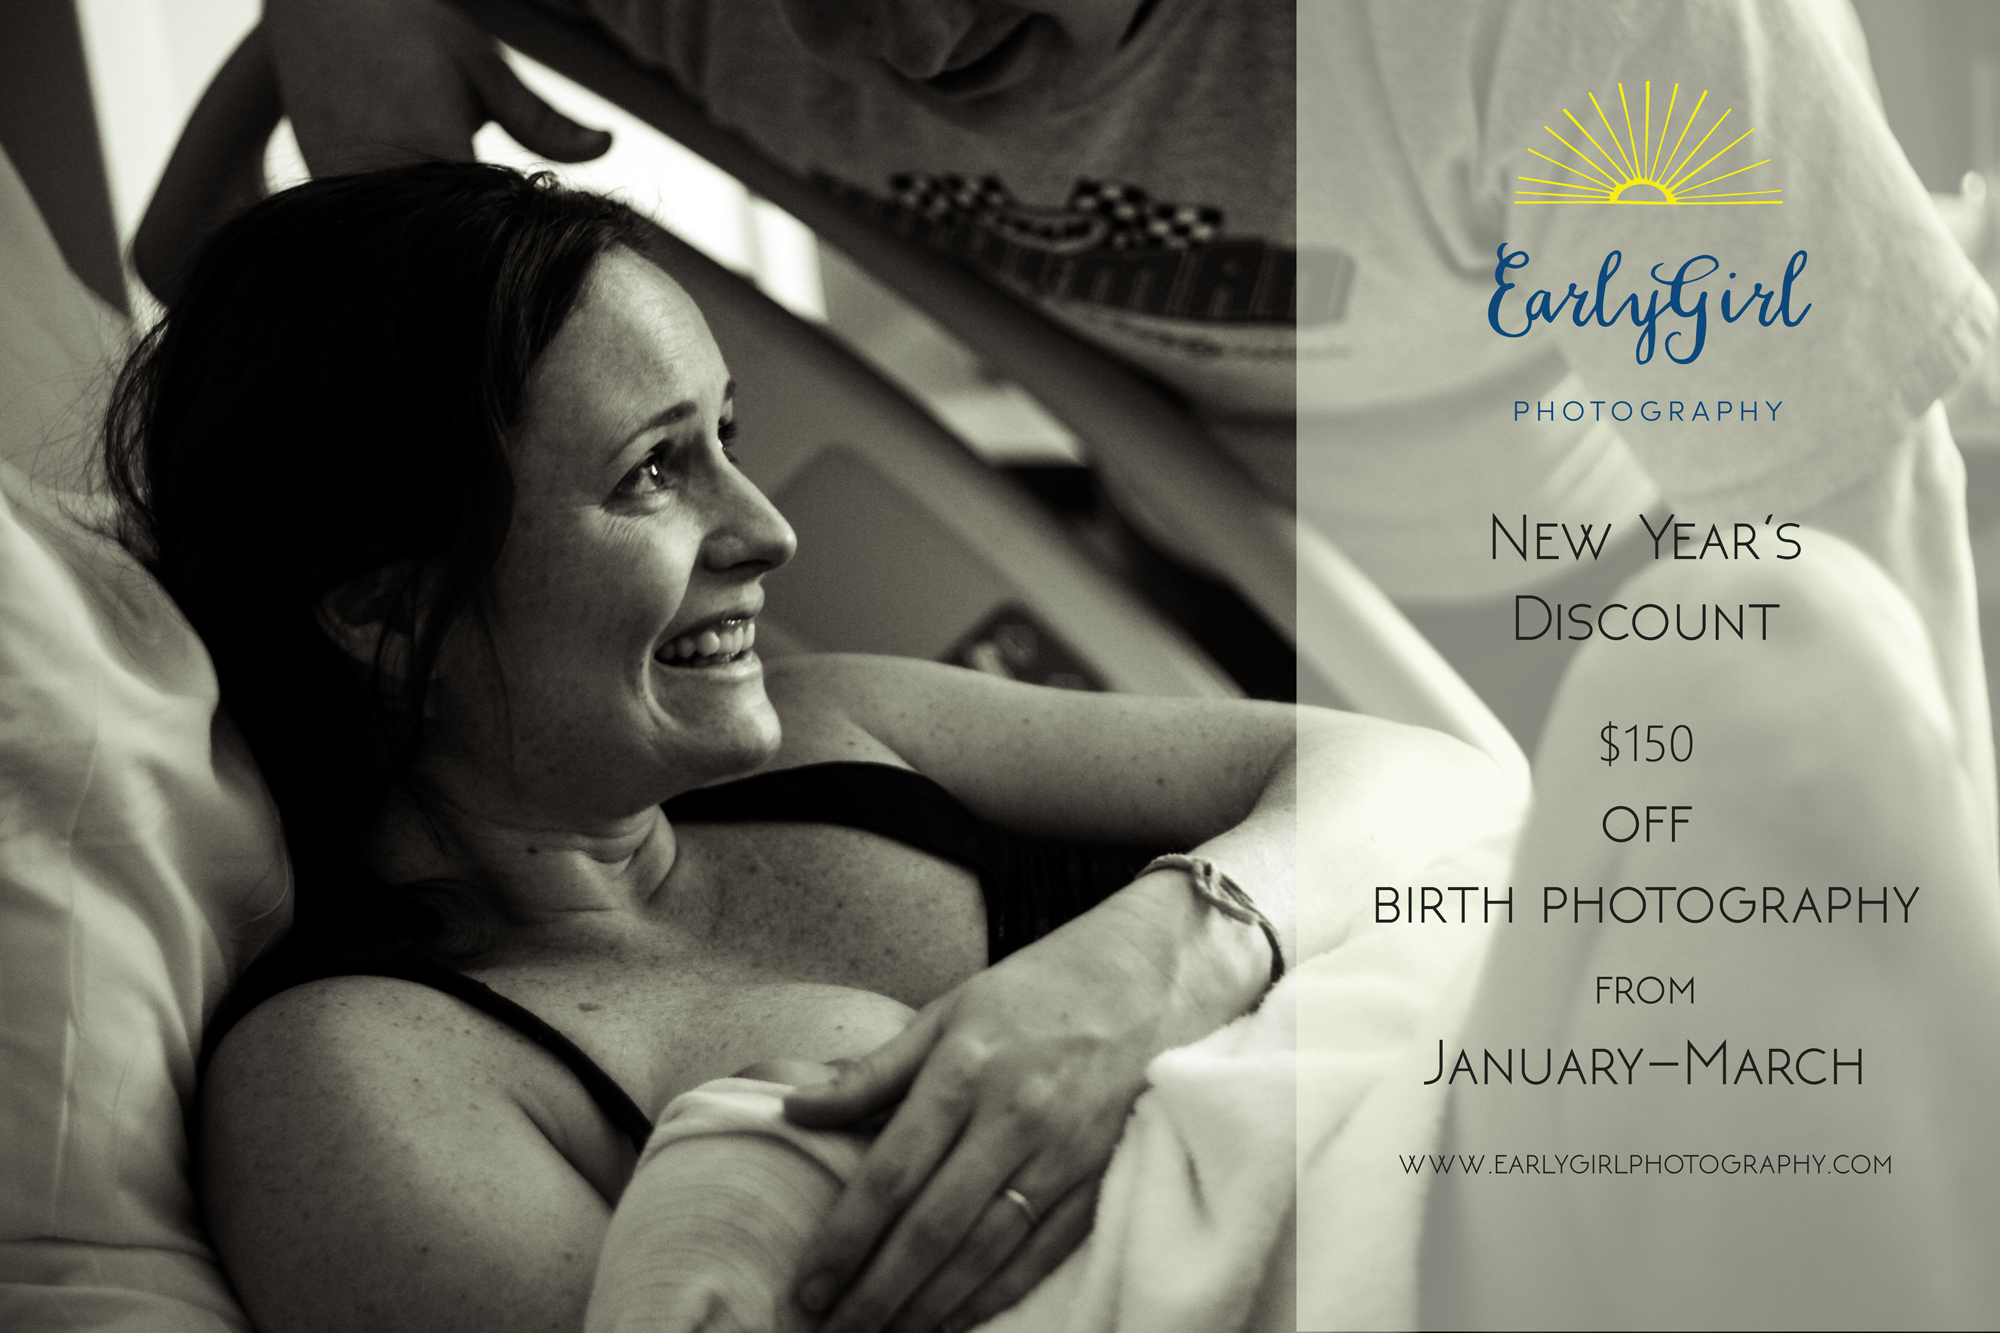 BirthPhotographyNY.jpg